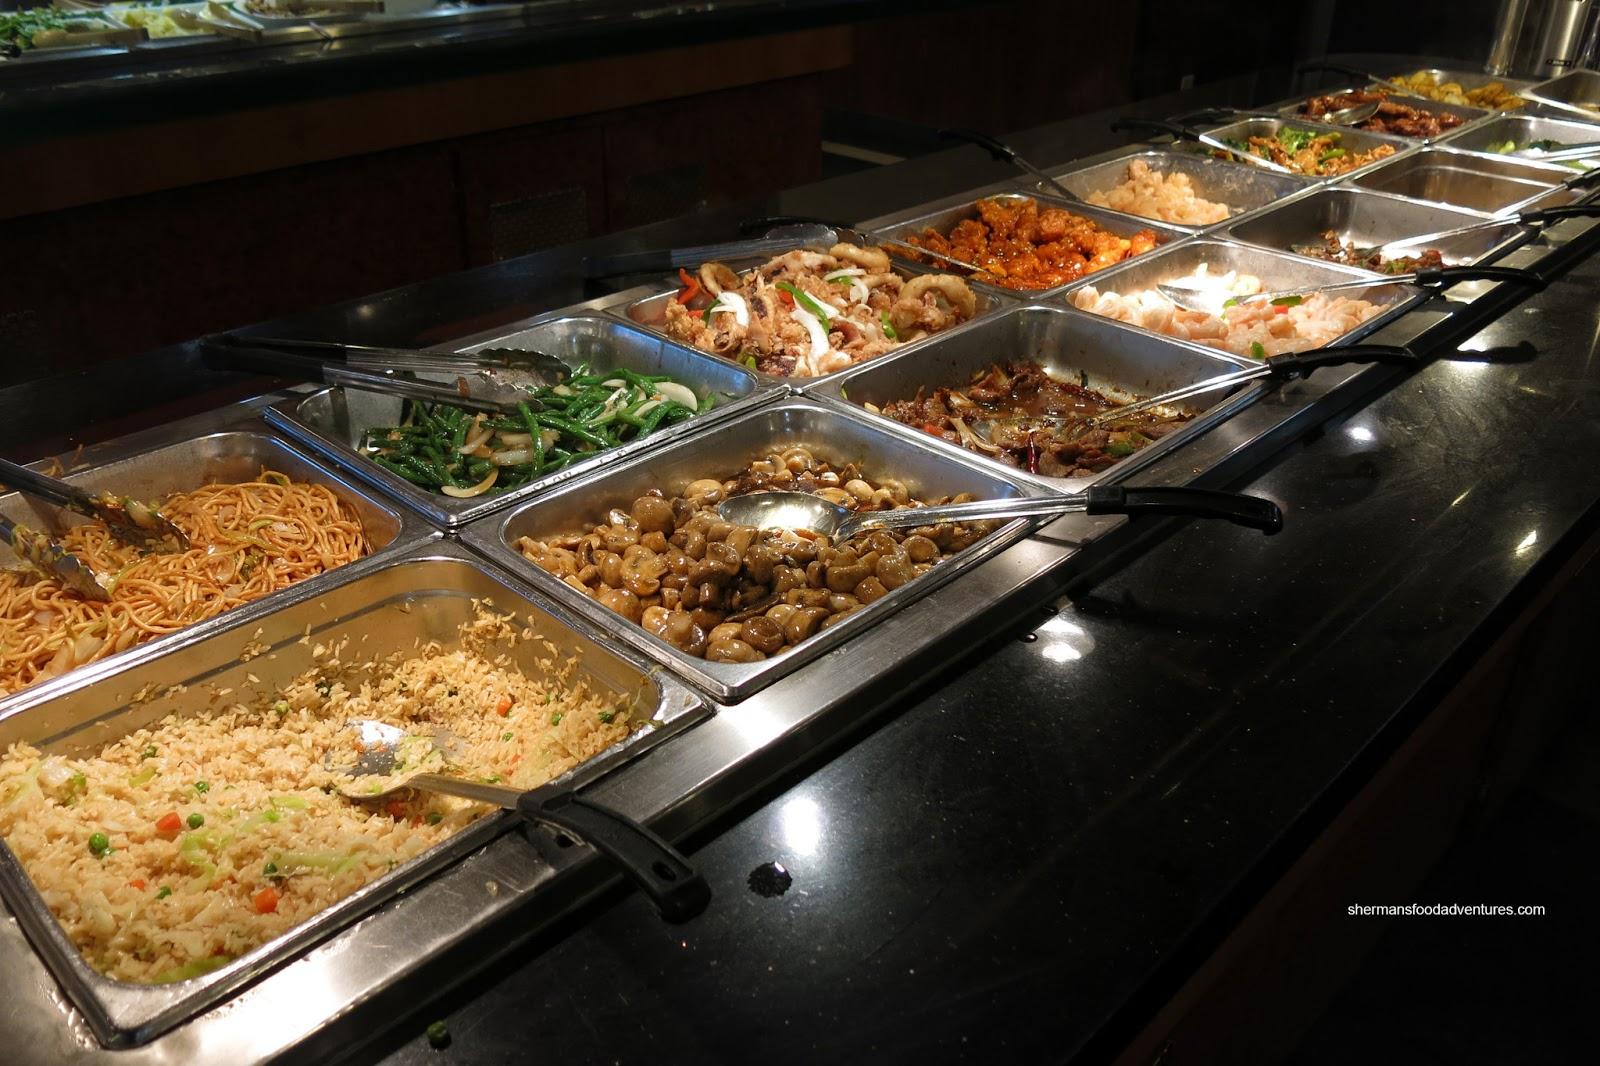 Sherman 39 s food adventures wonderful buffet for Asian cuisine buffet